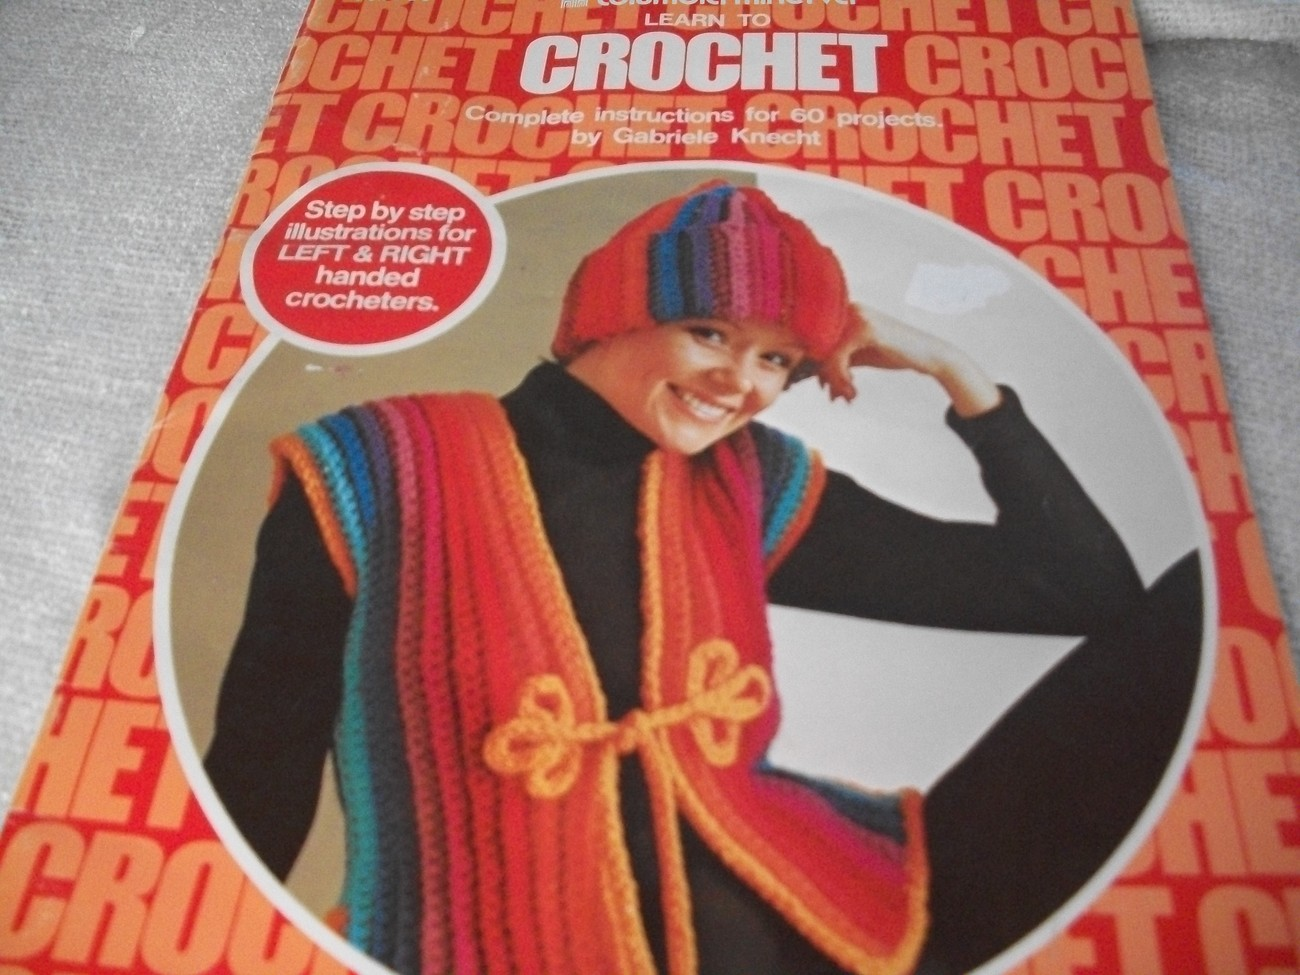 Learn To Crochet Book - $18.00